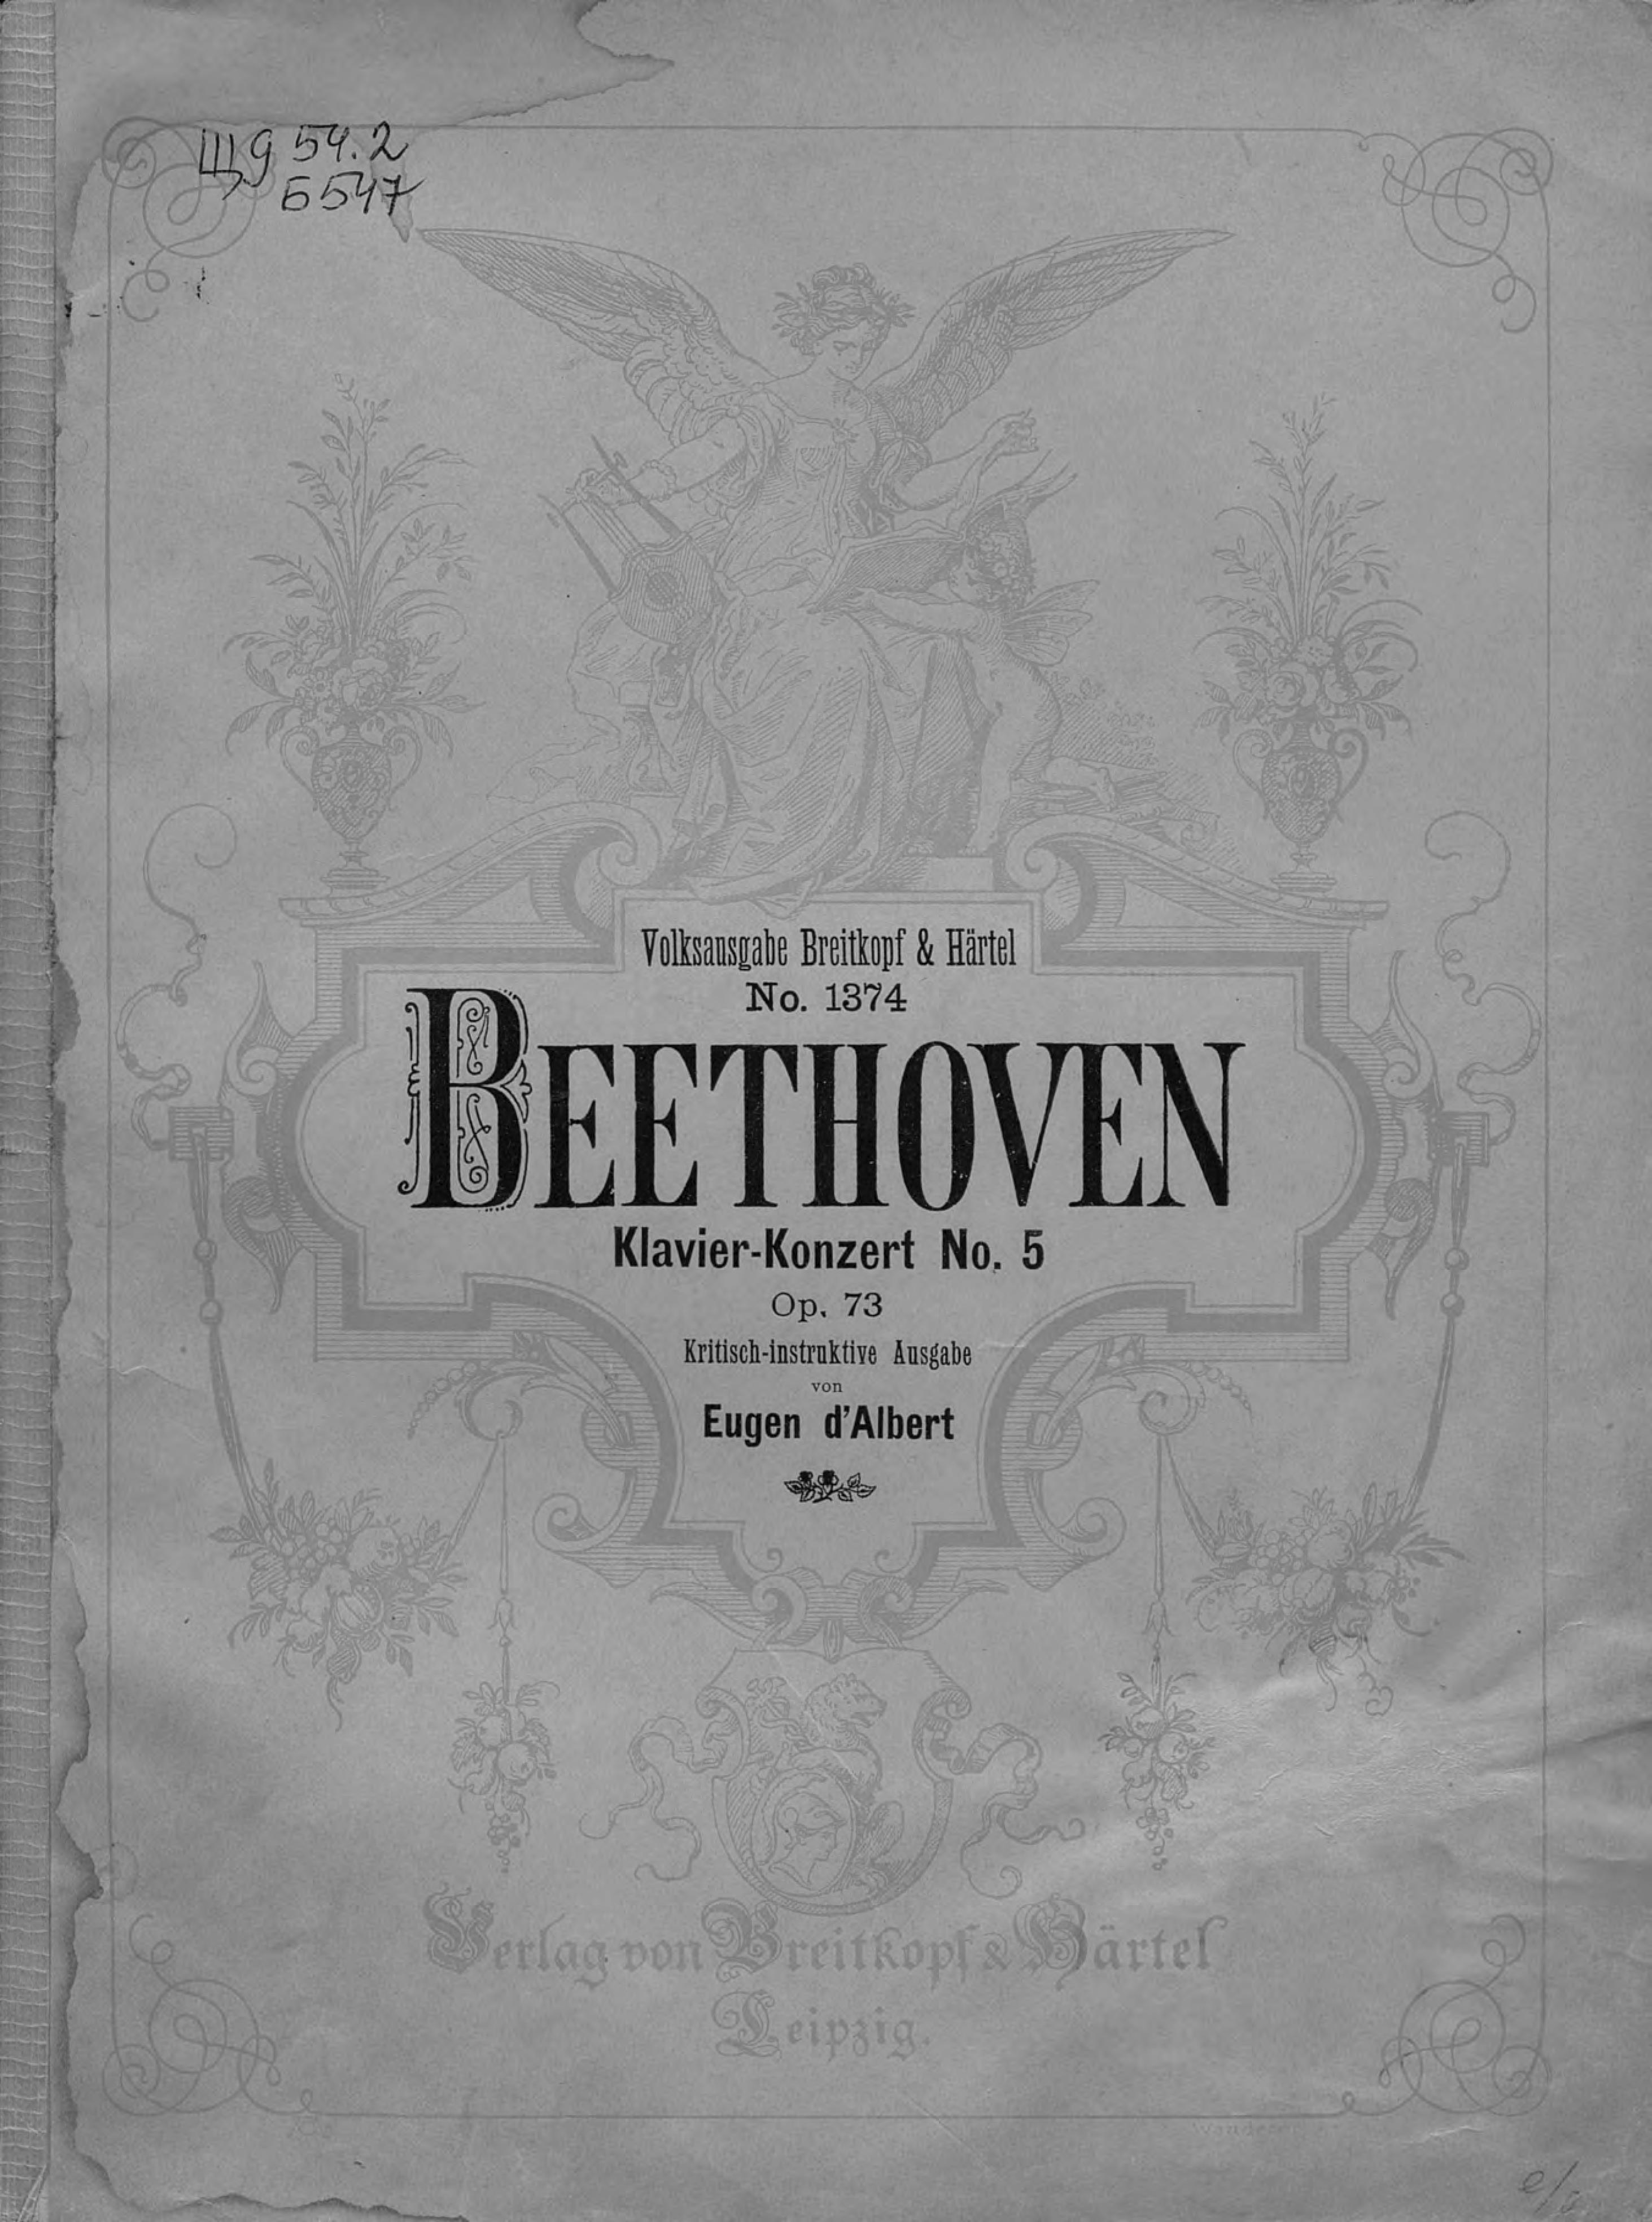 цена на Людвиг ван Бетховен Klavier-Konzert № 5 op. 73 (Es-dur)